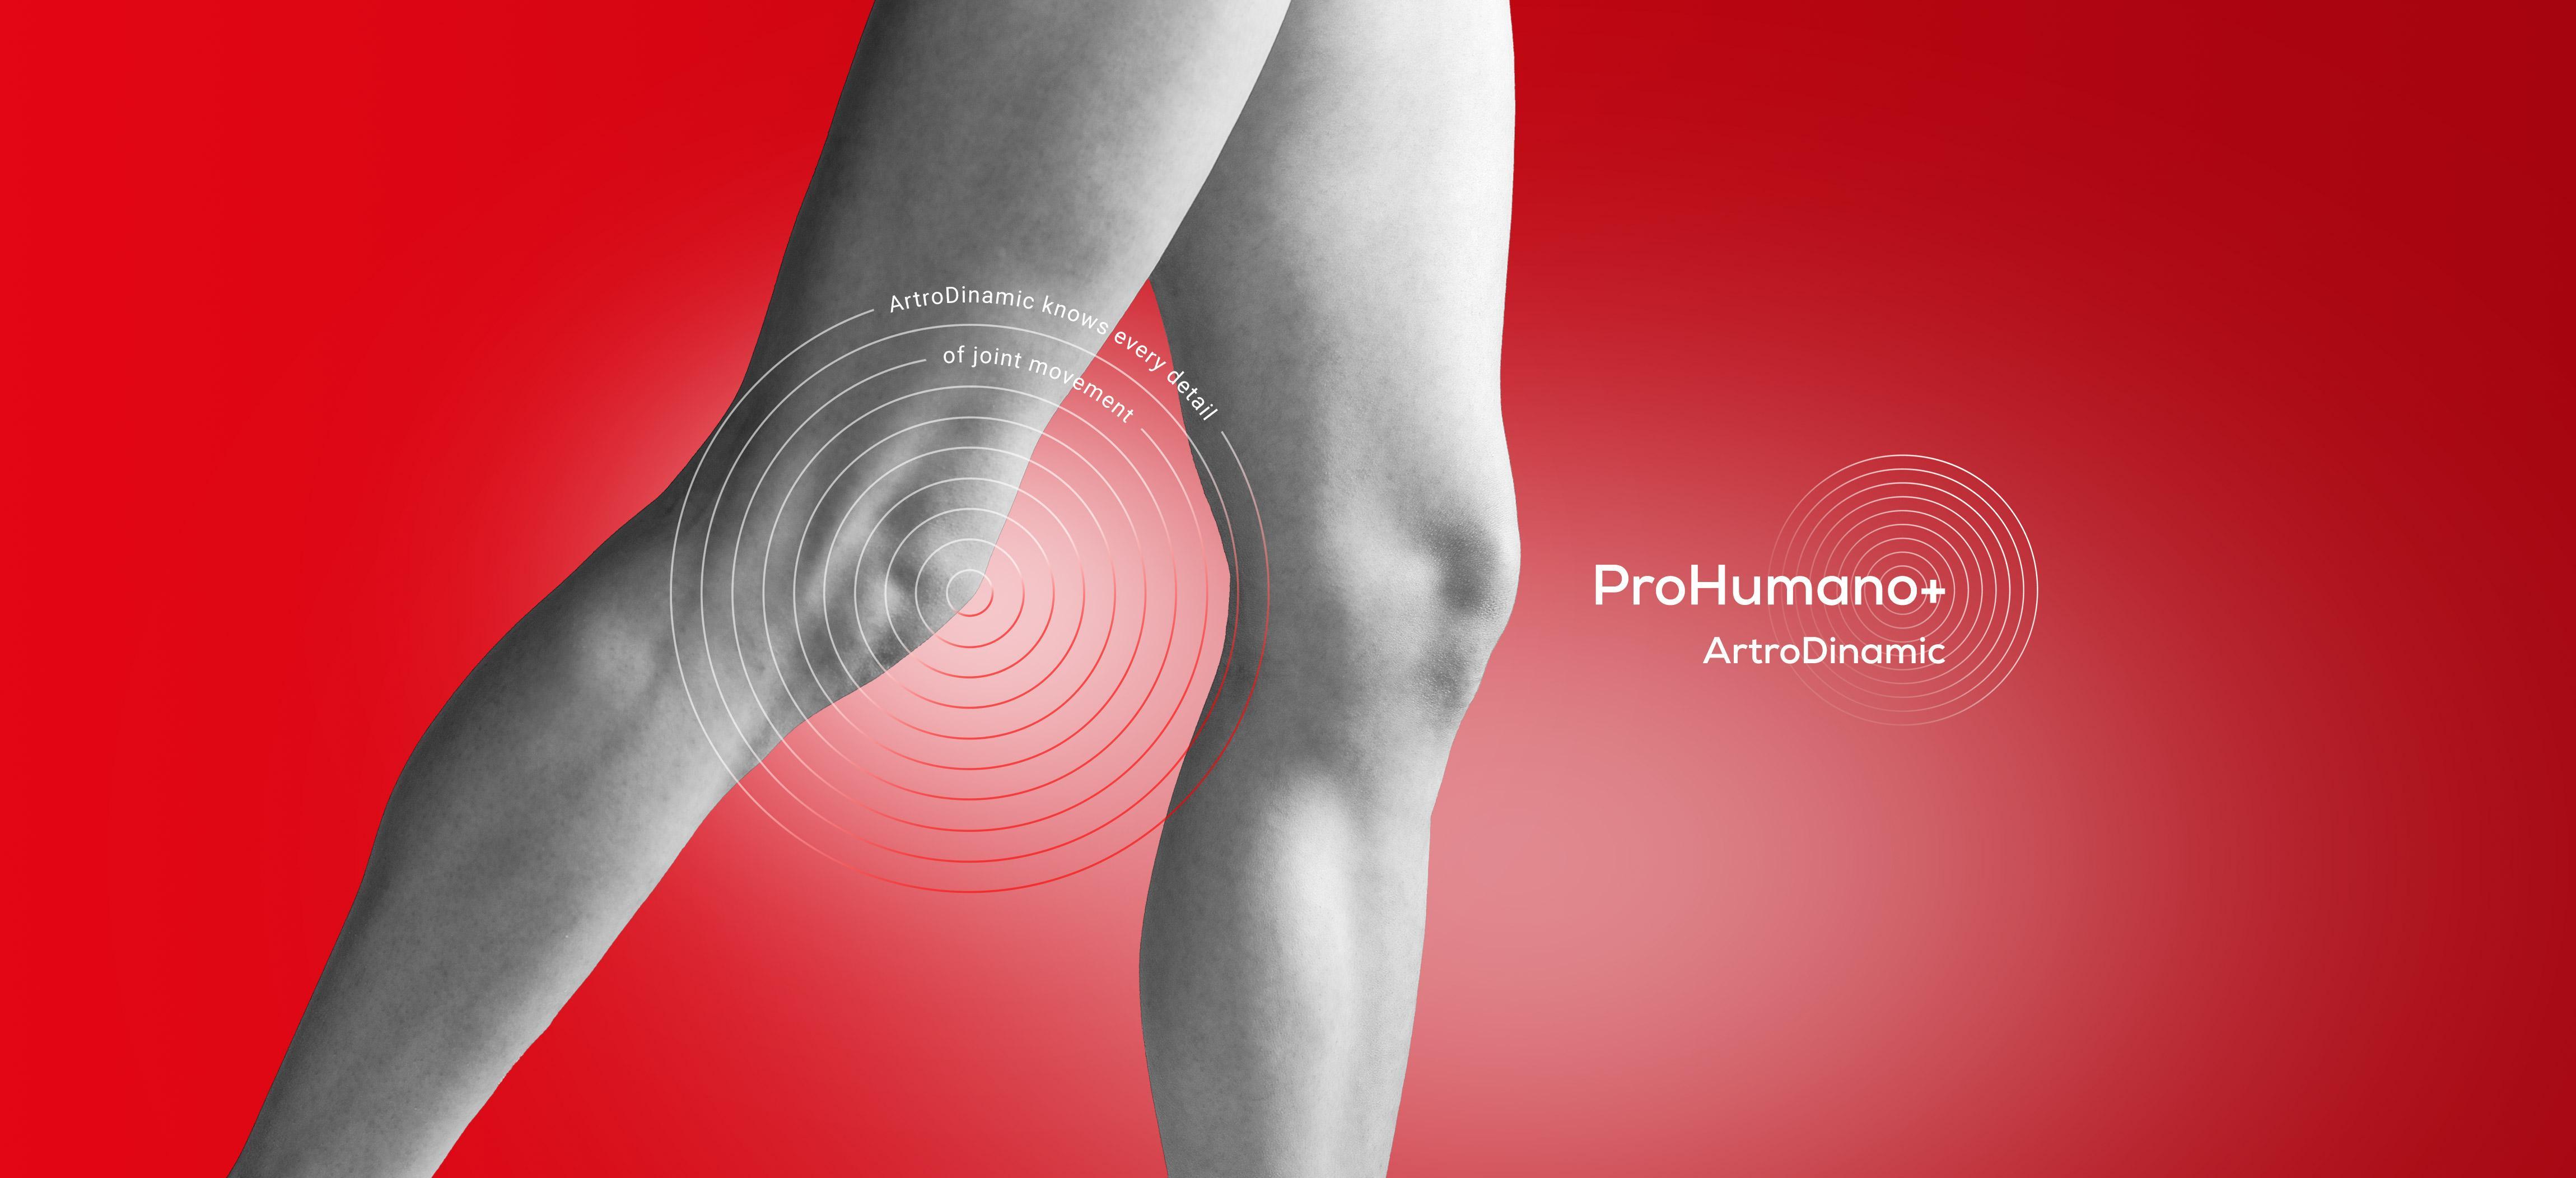 ArtroDinamic supports cartilage regeneration